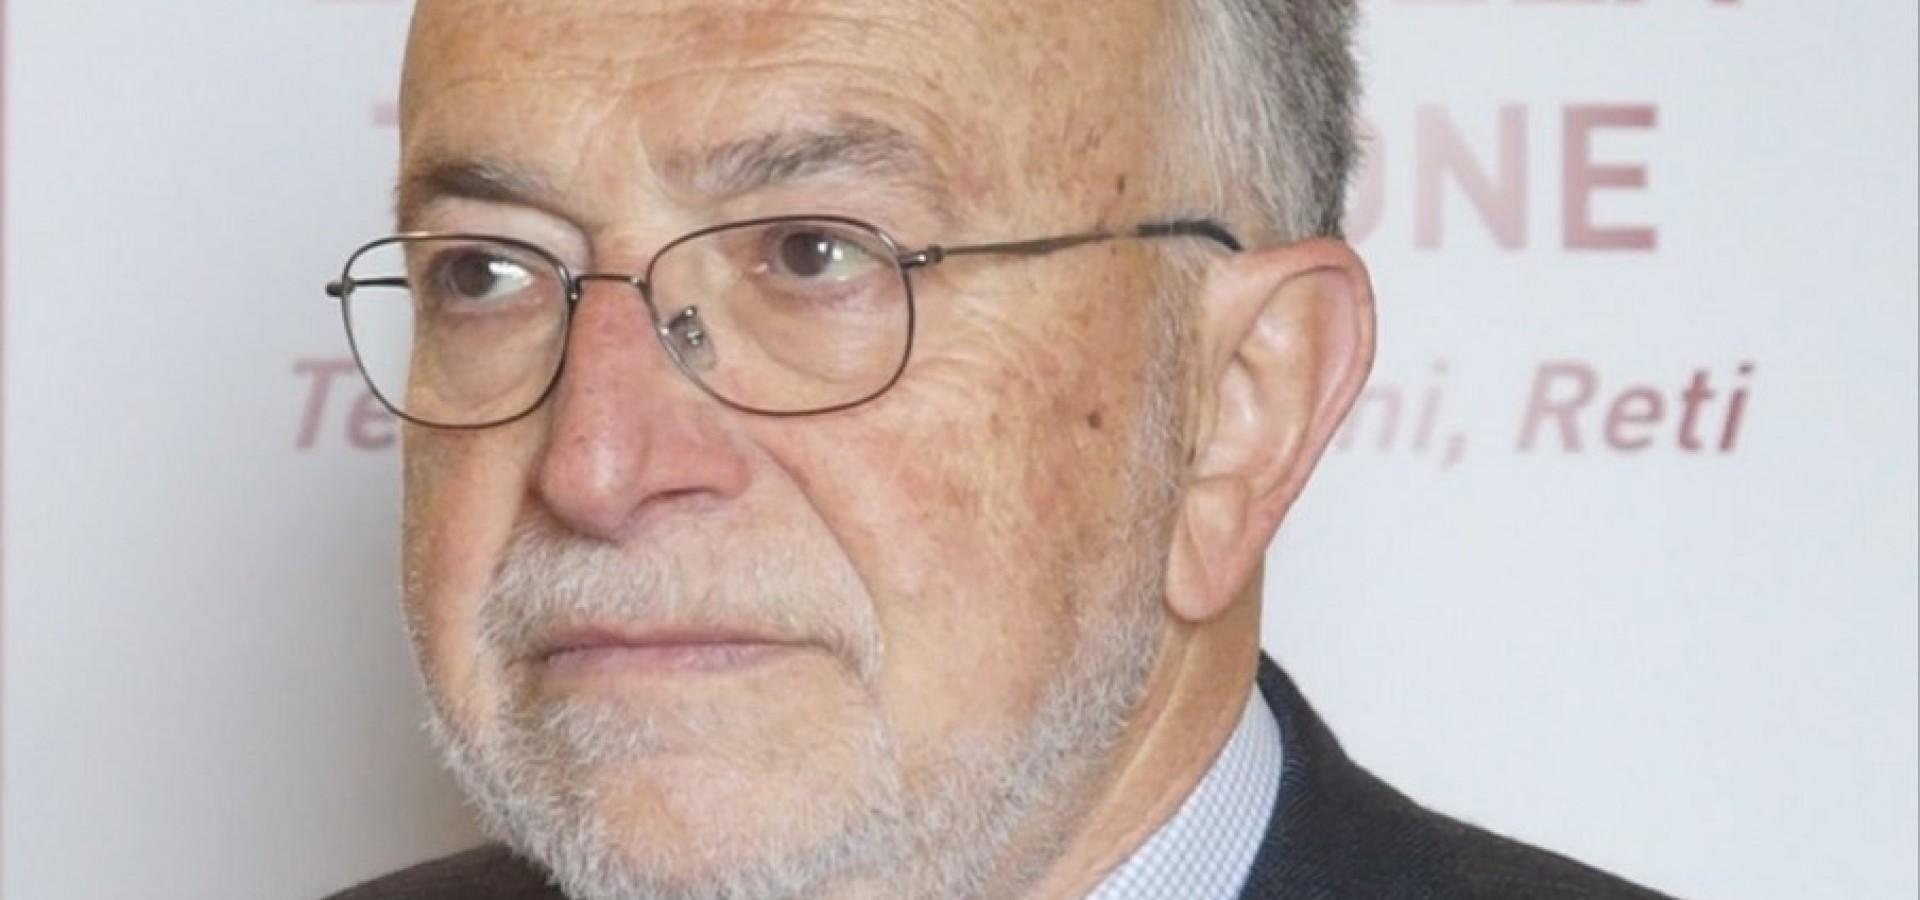 prof. Ugo De Siervo